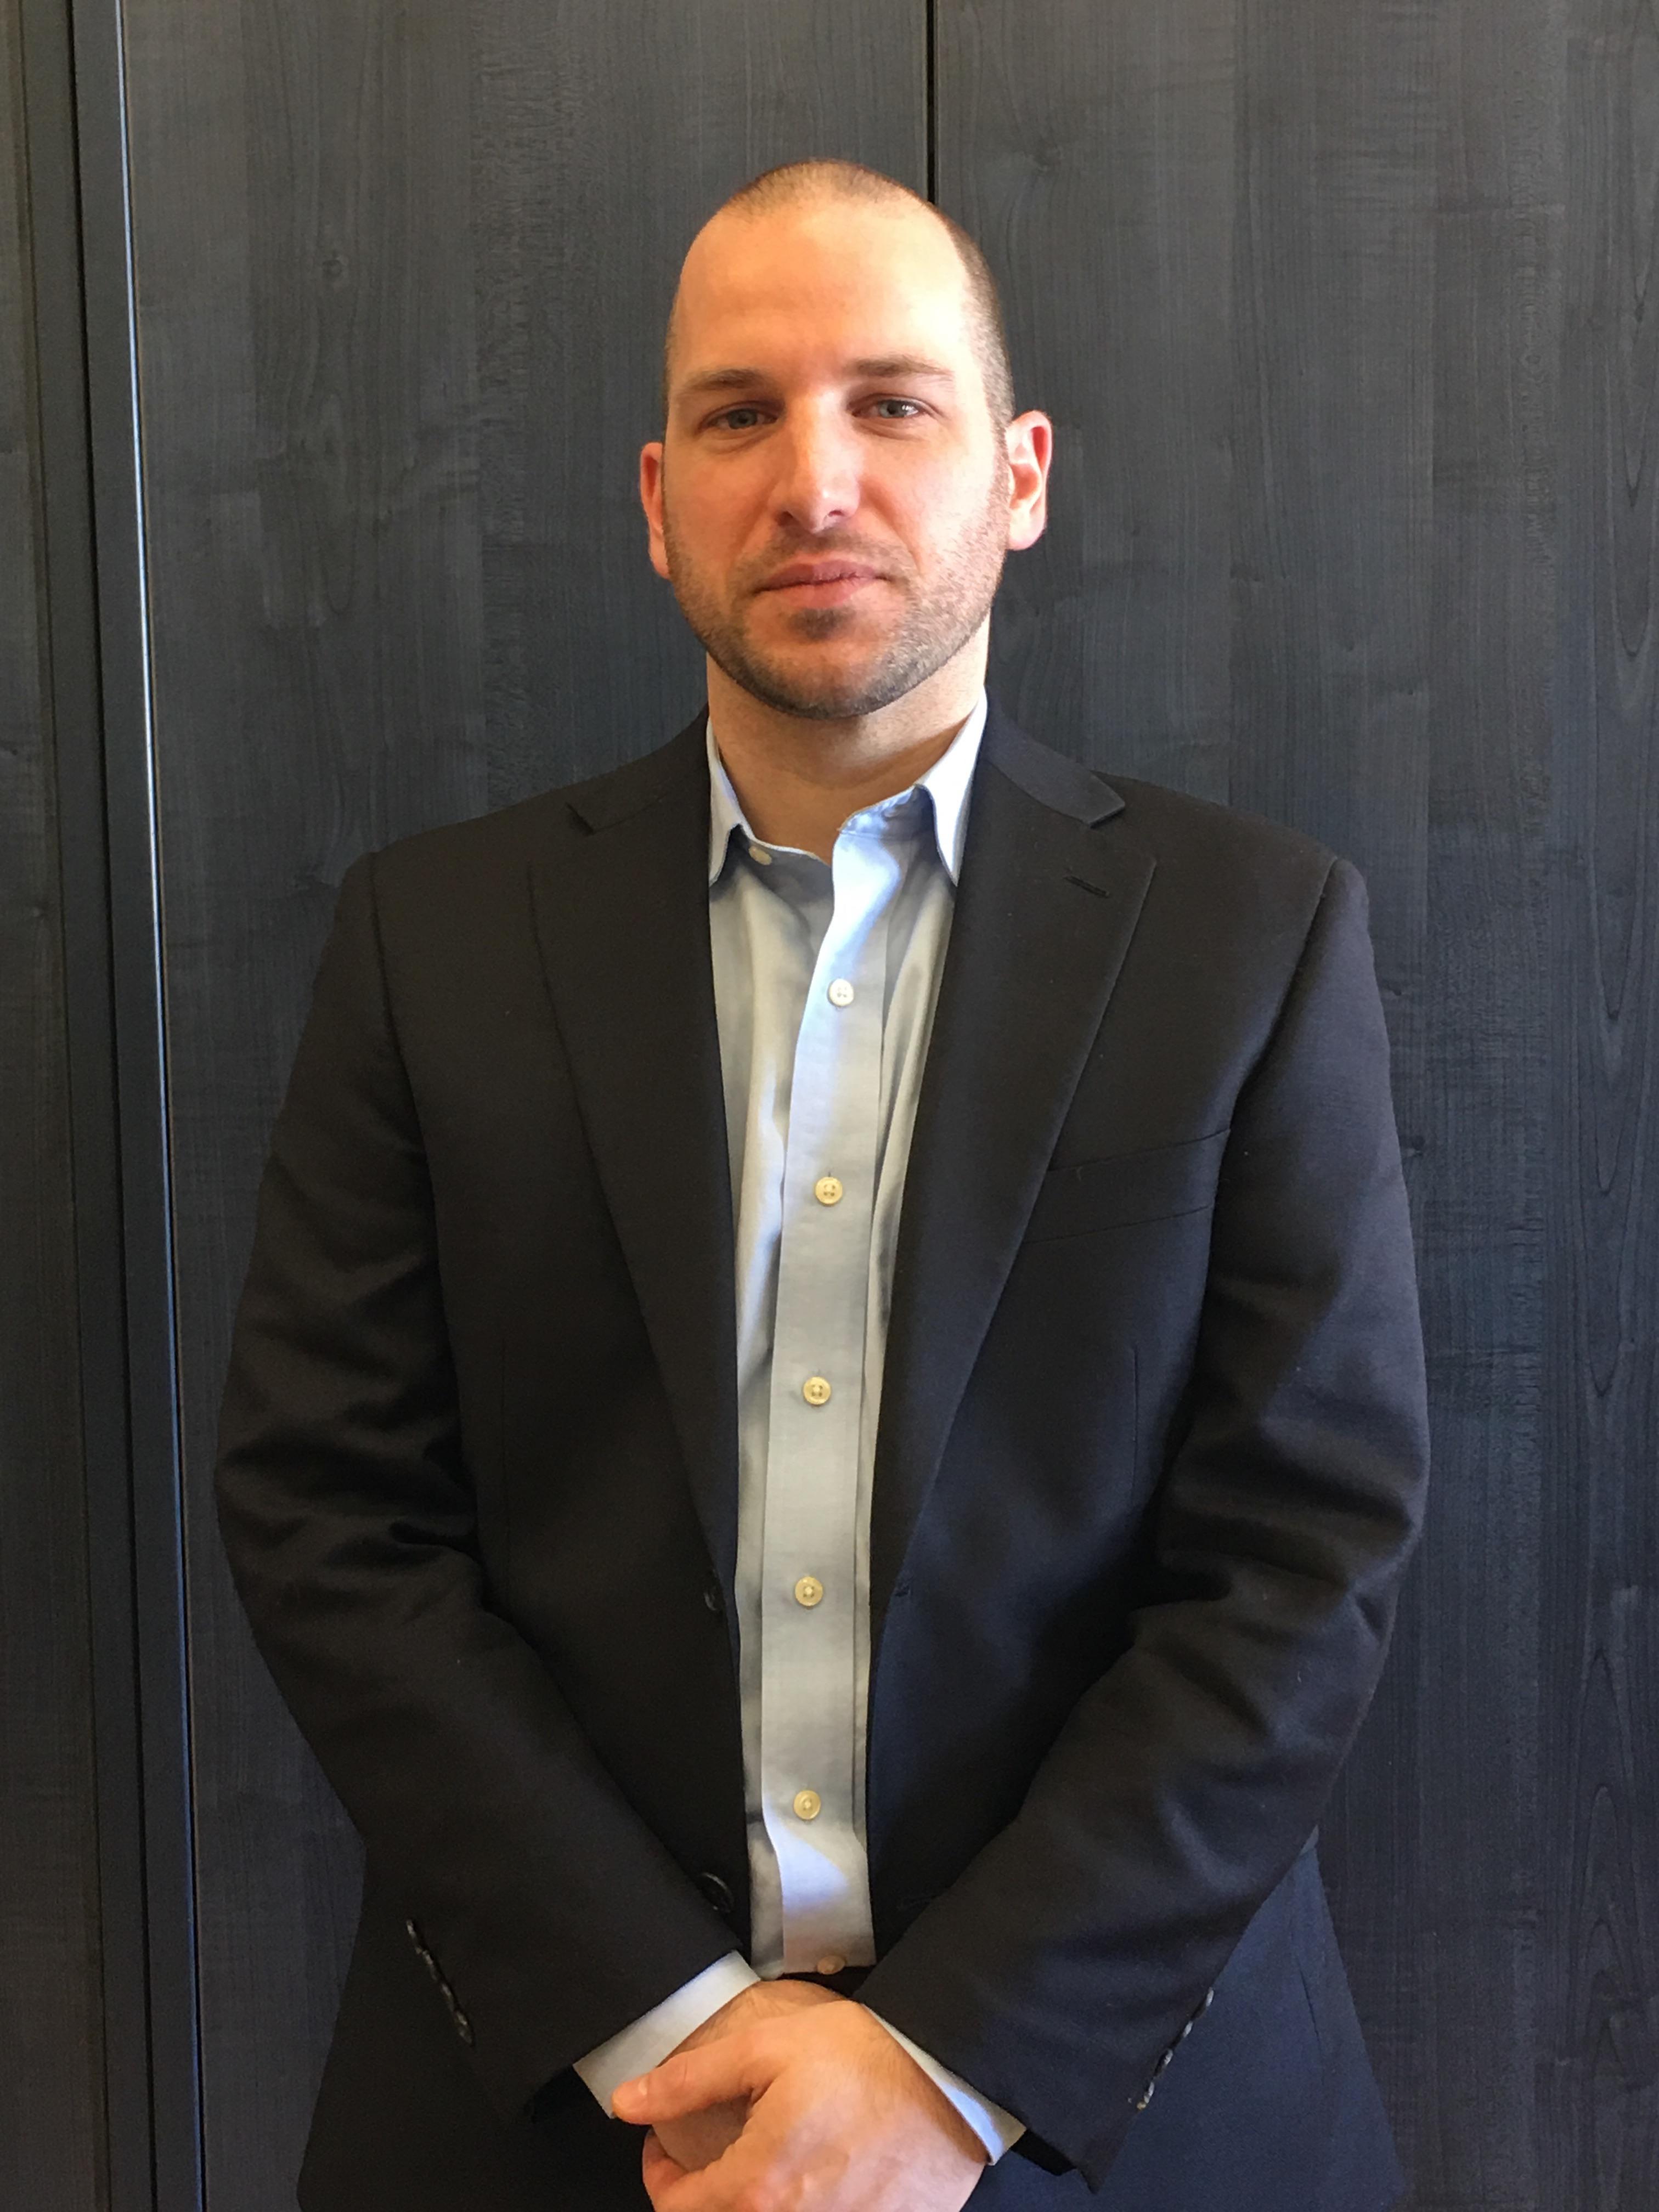 Nicolas Paquet